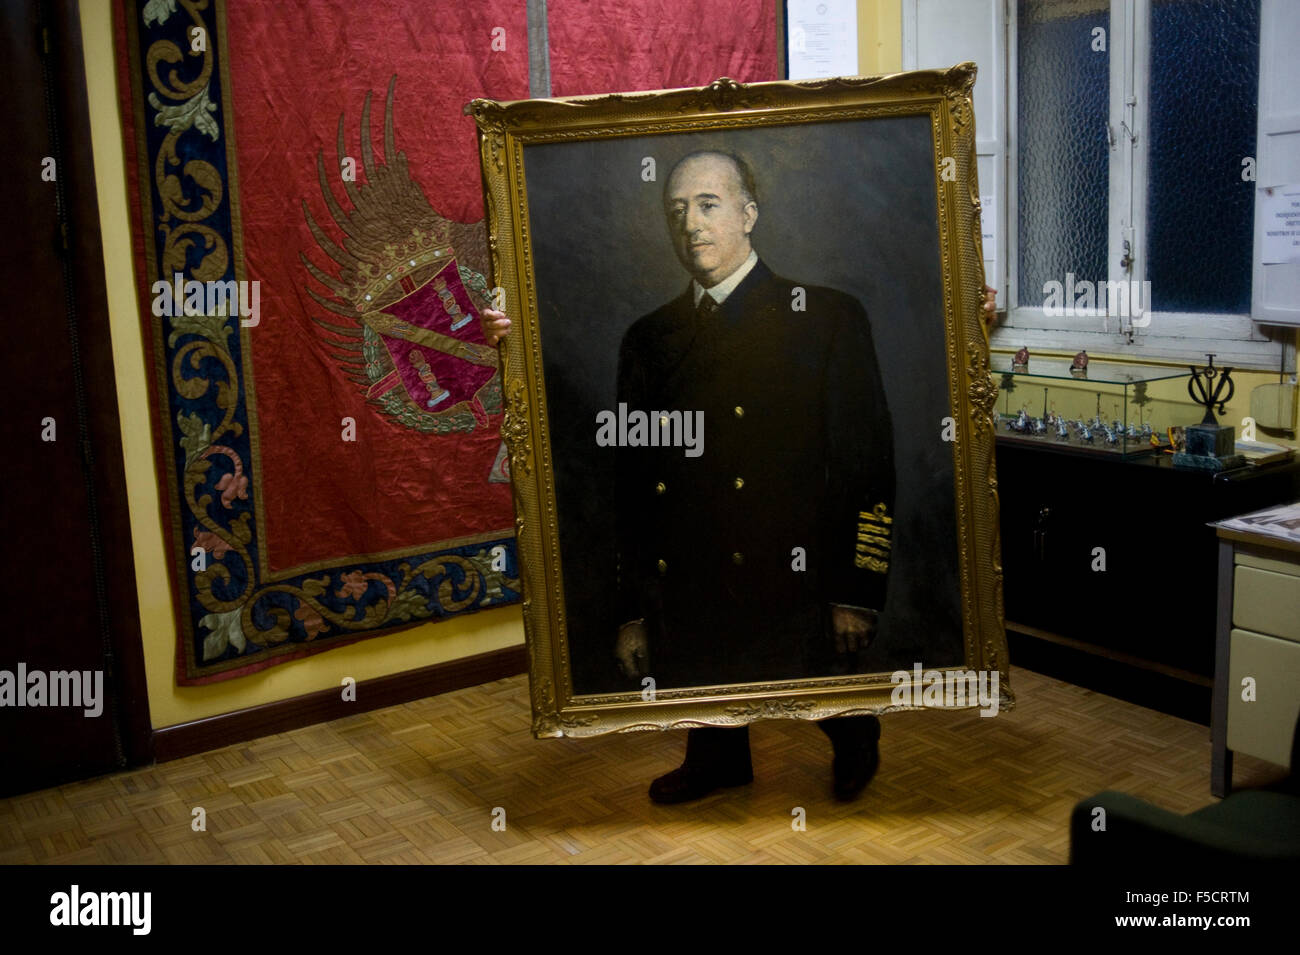 Francisco franco foundation in madrid spain fundacion franquismo dictator general generalisimo dictatorship spanish